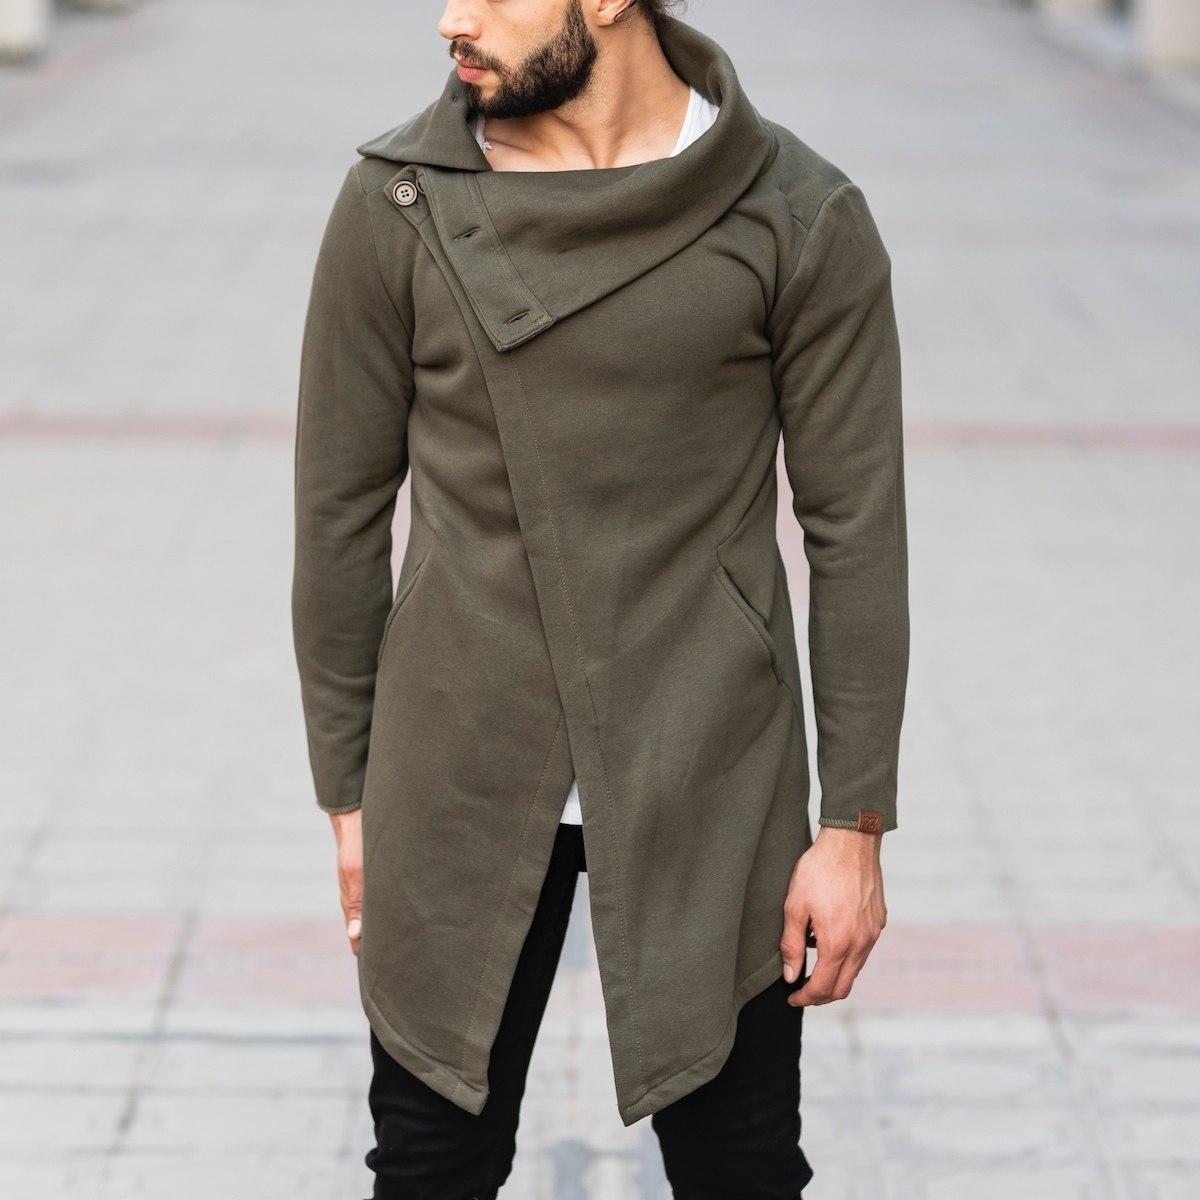 Cape Style Khaki Pancho MV Jacket Collection - 1